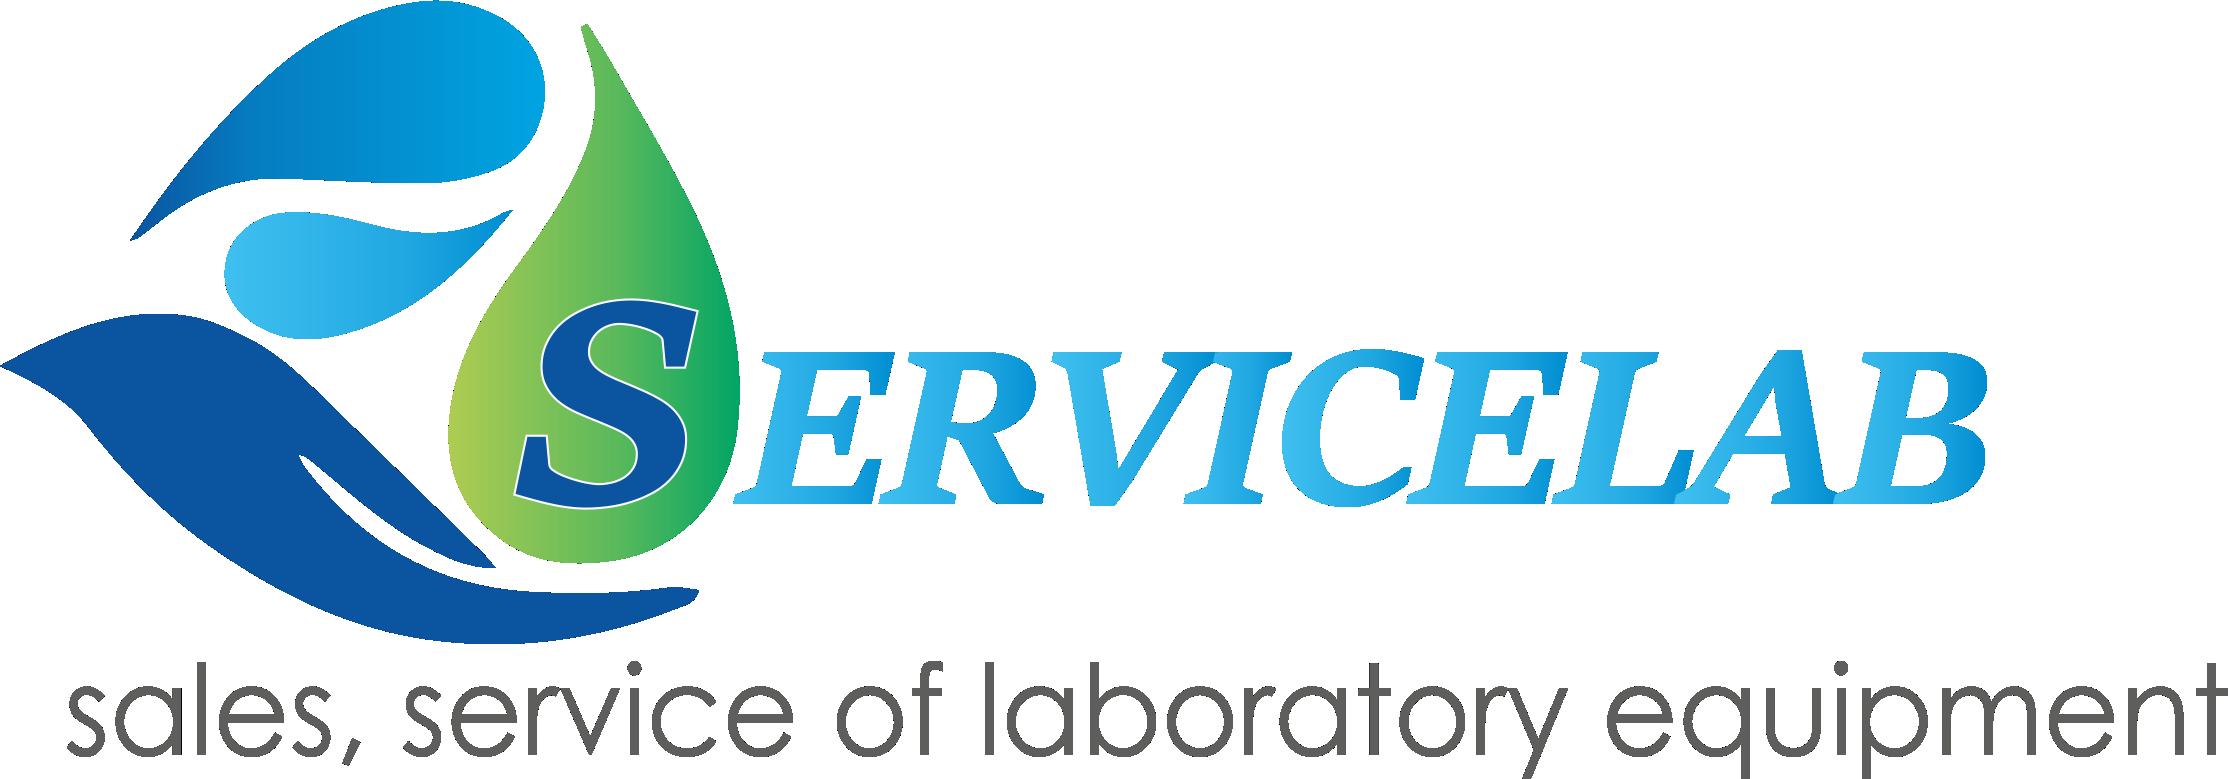 ServiceLab LLC